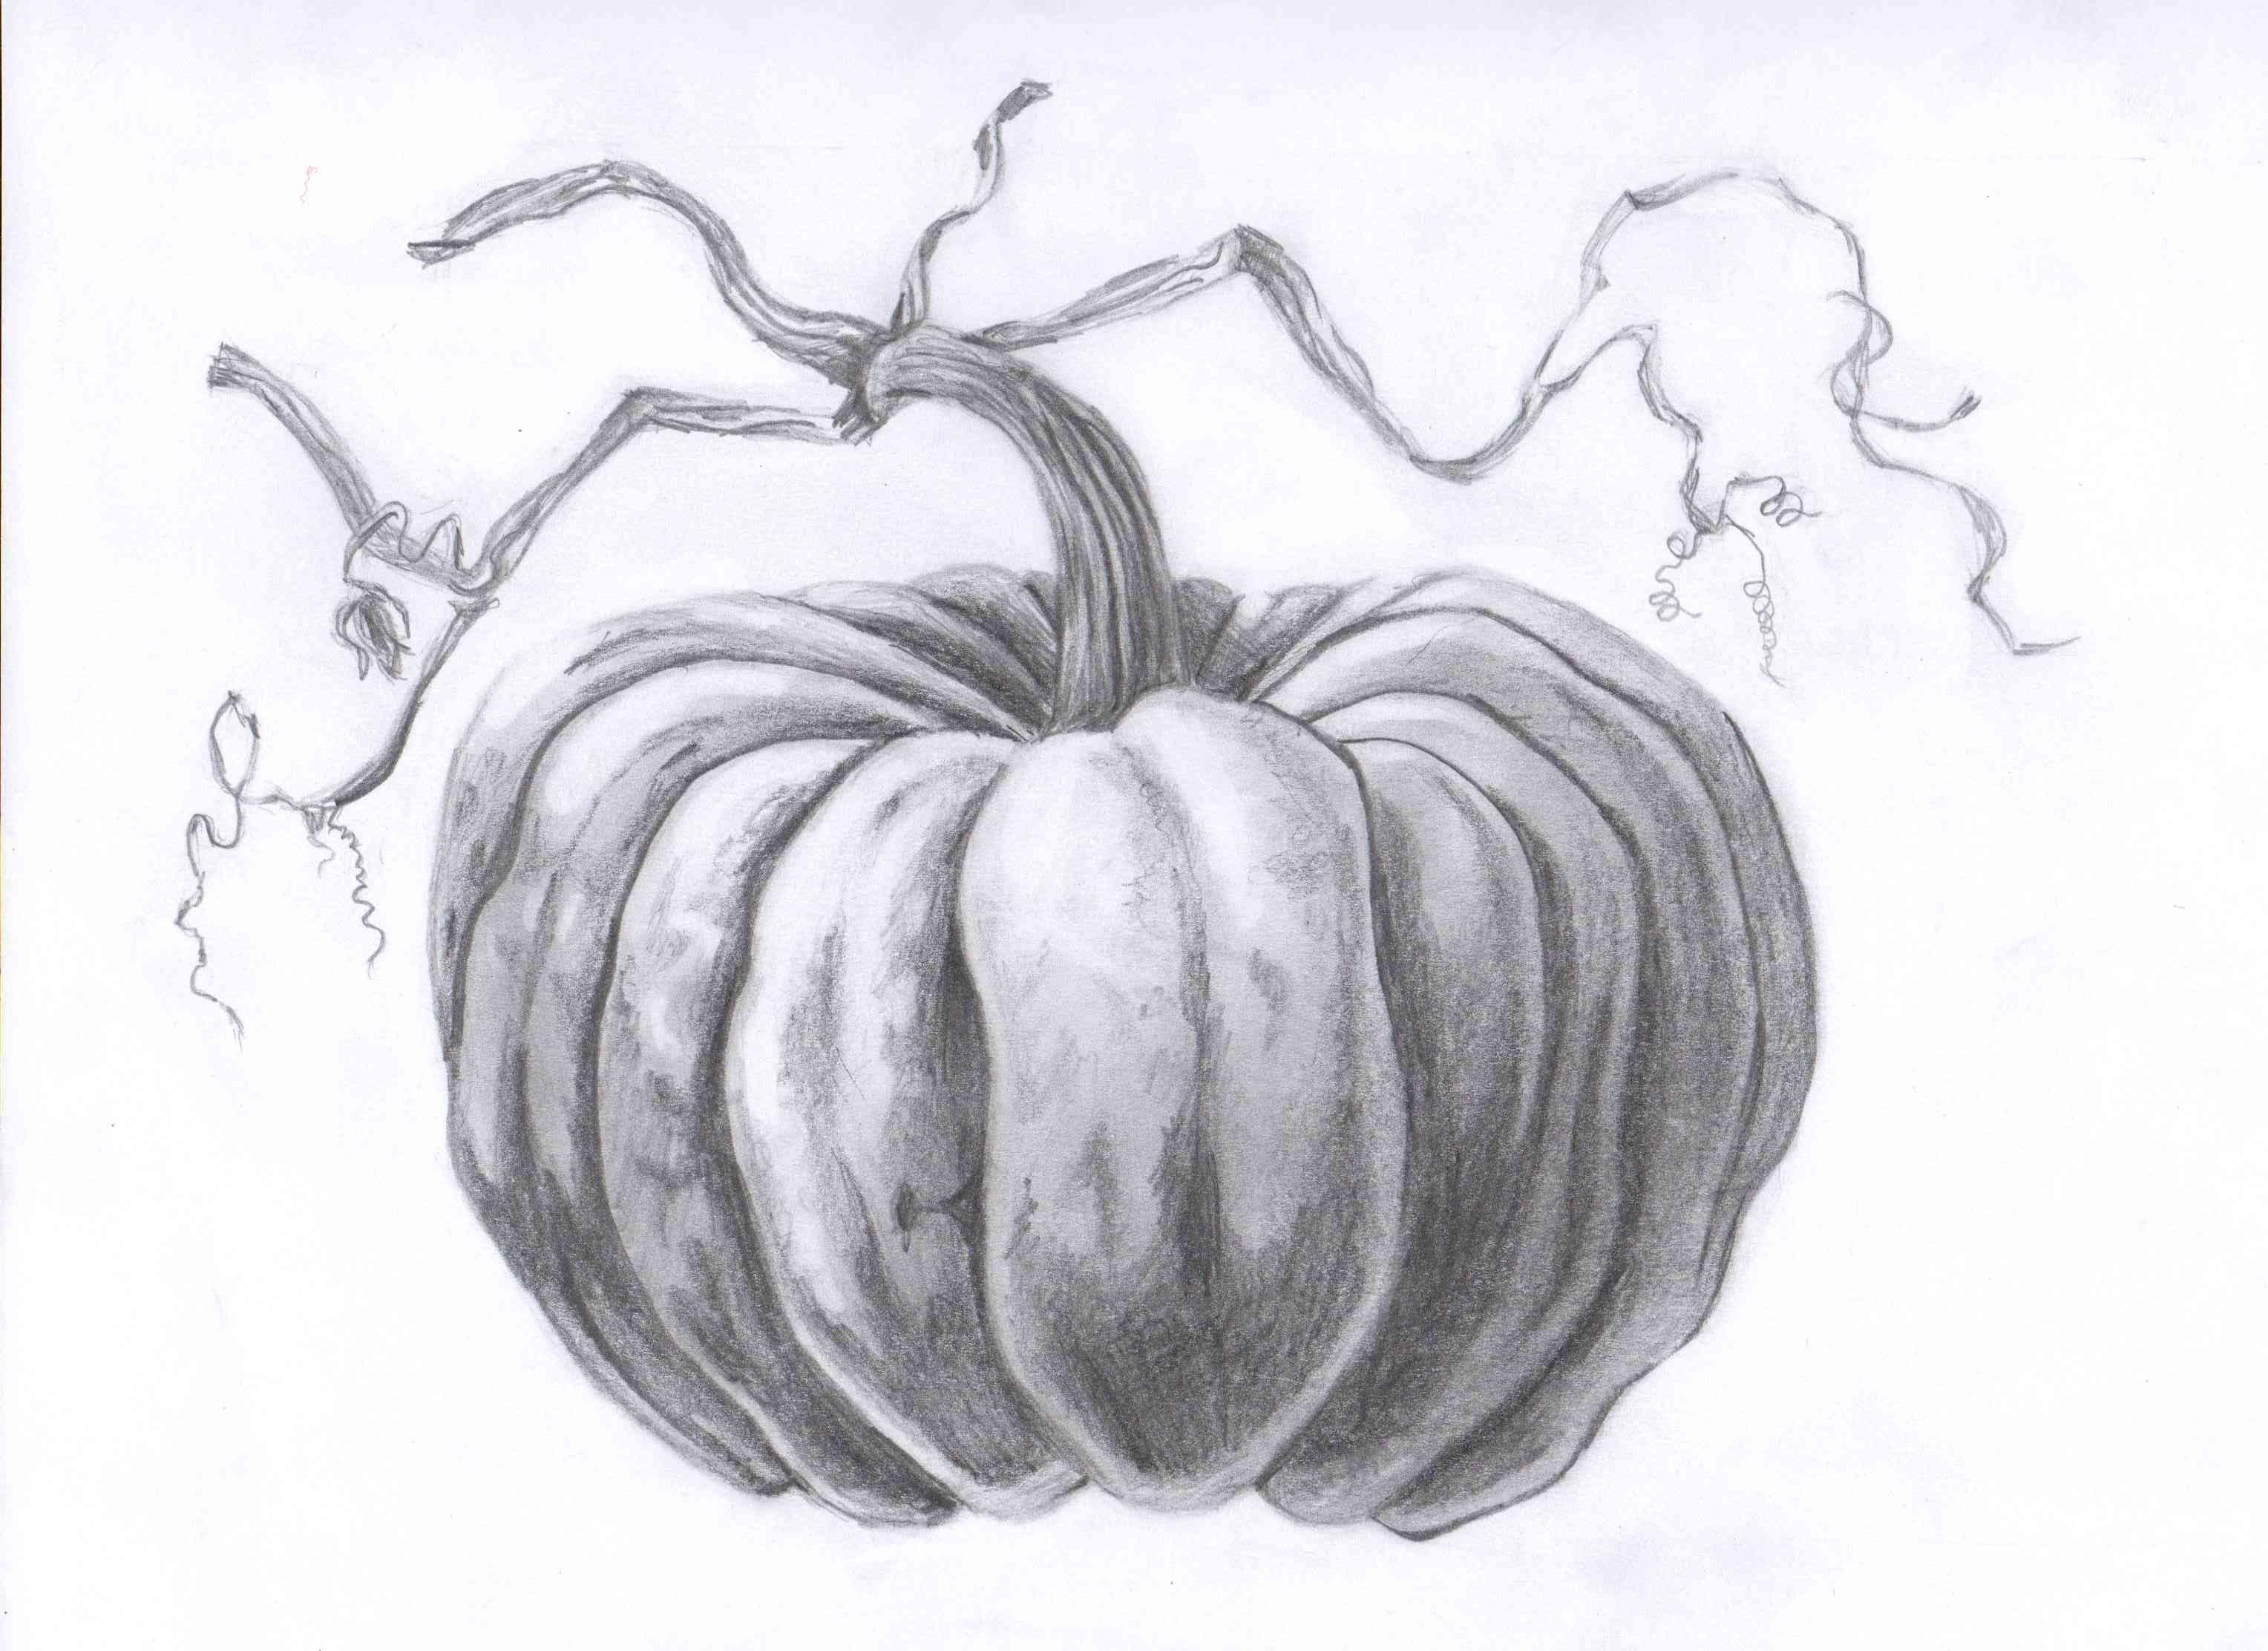 Drawn pumpkin realistic Pinterest Pumpkins Life on best